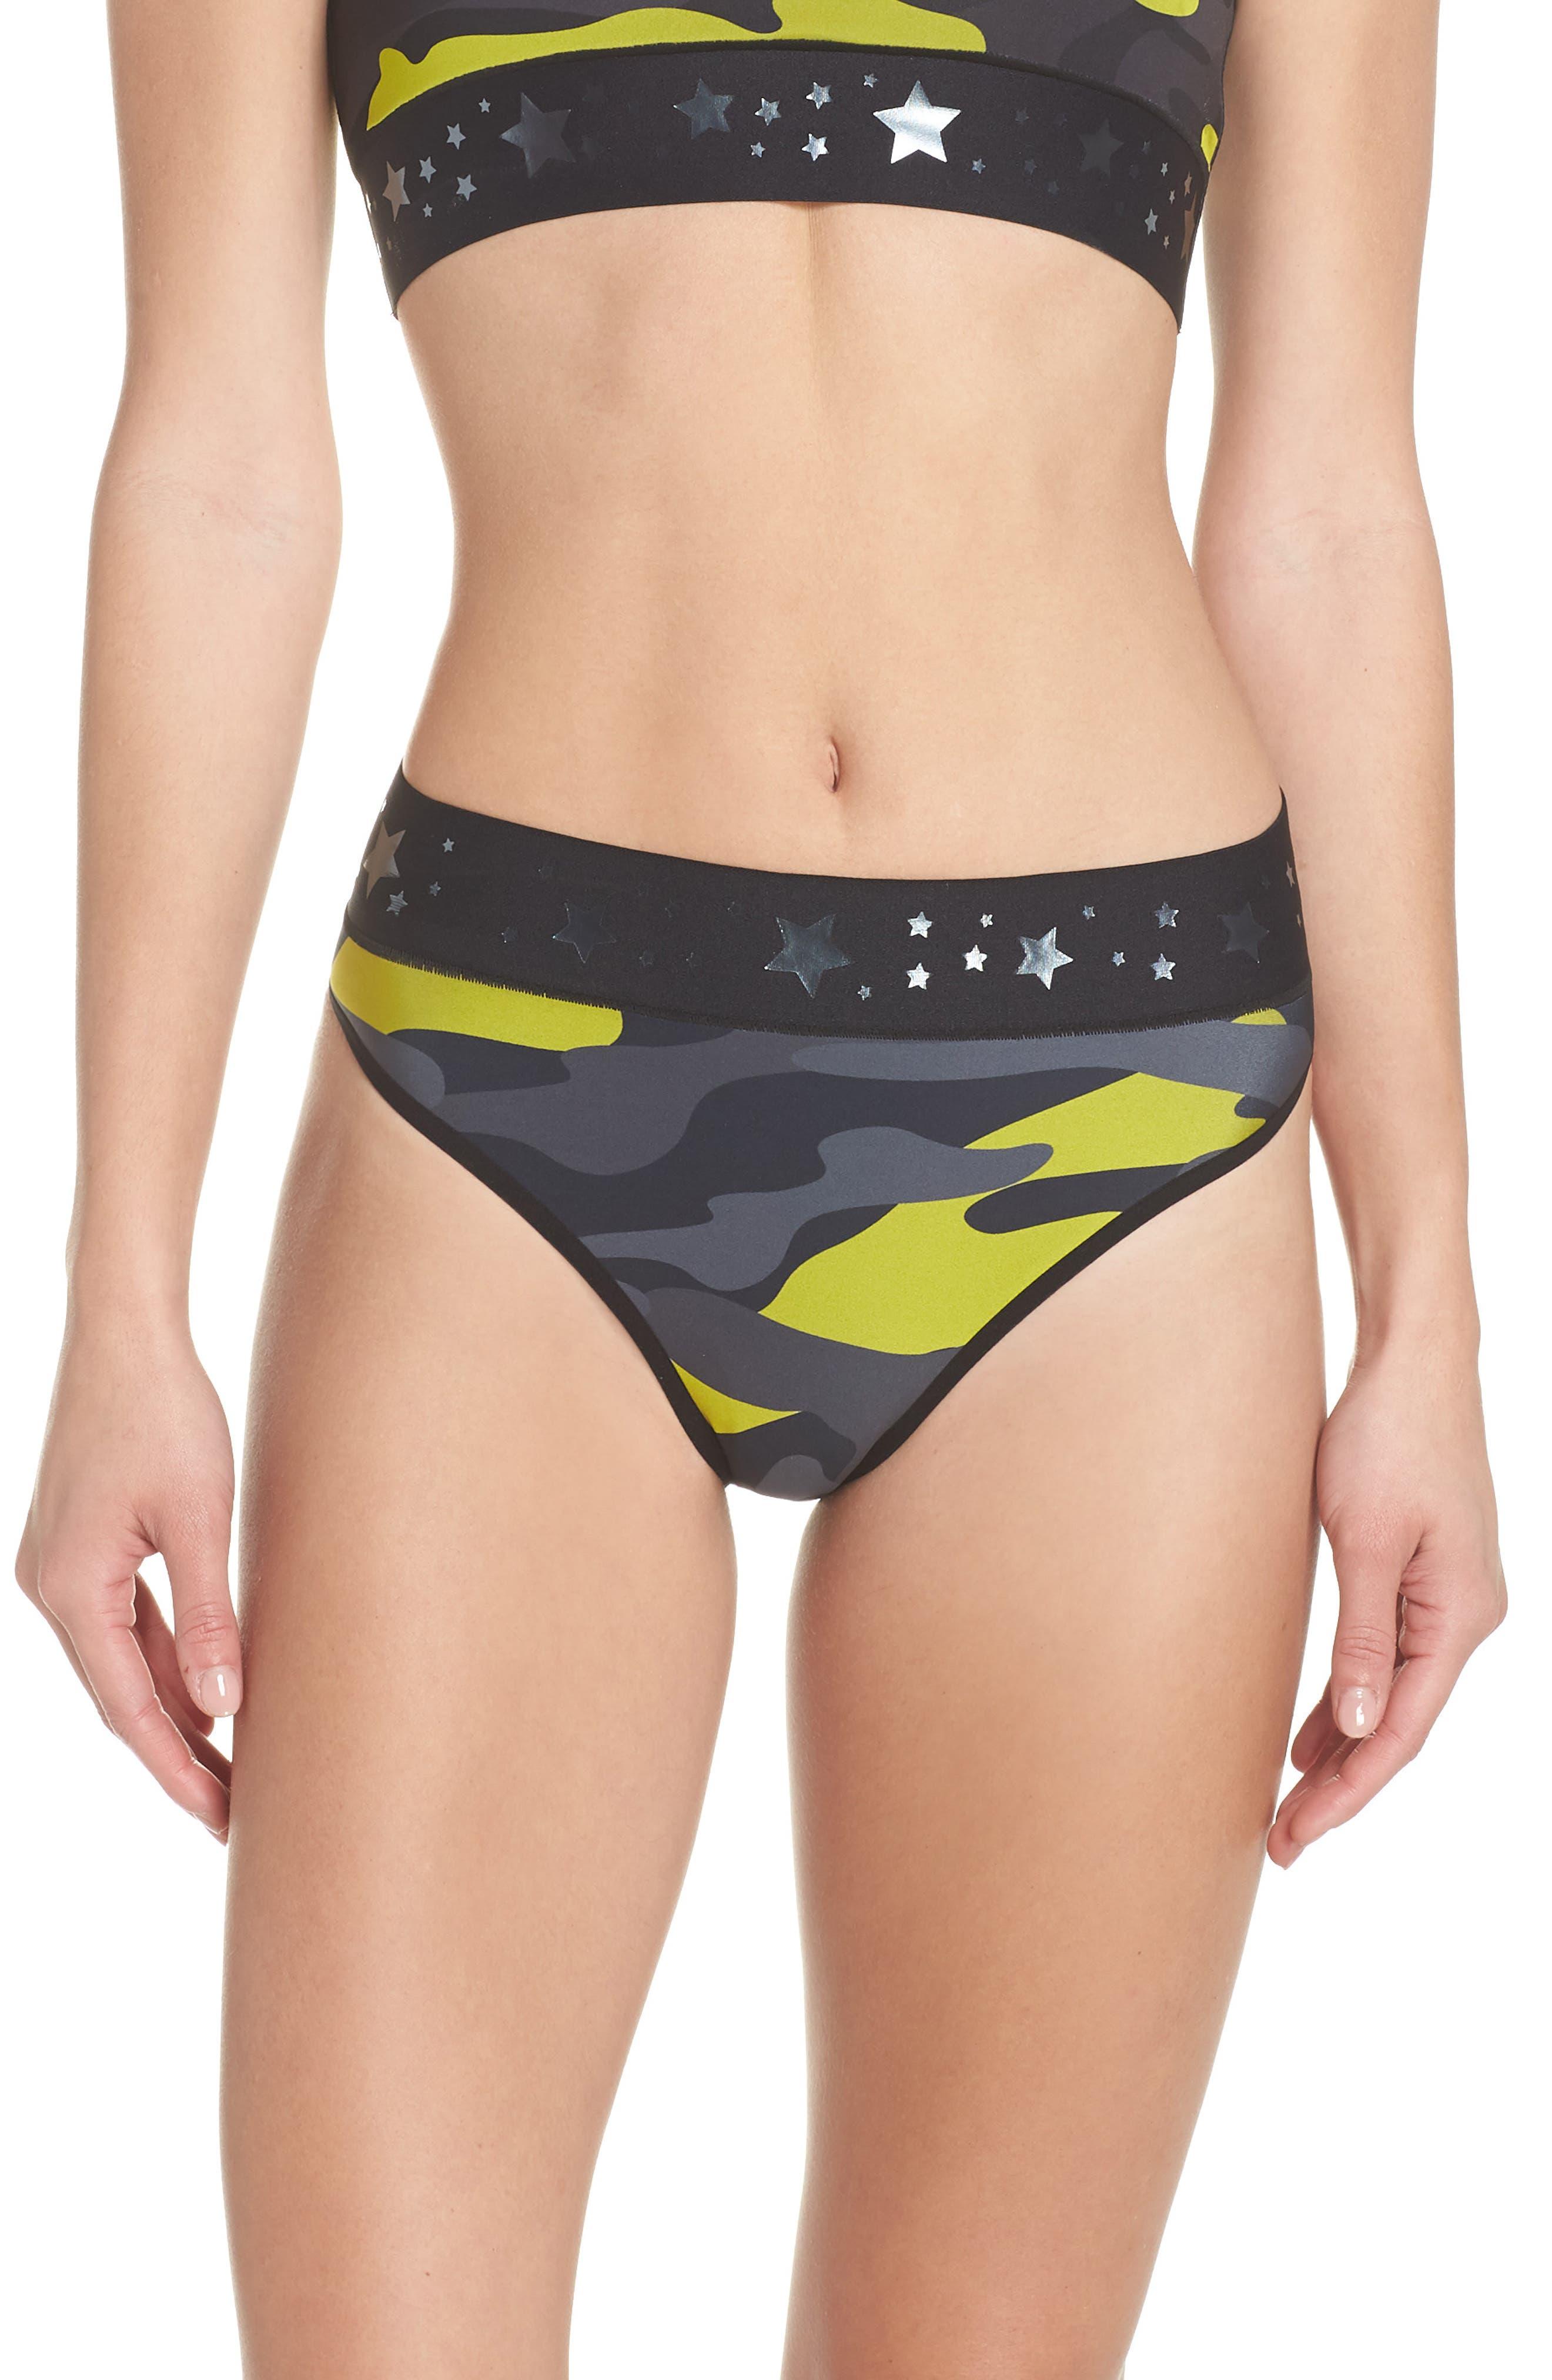 Argon Camo High Waist Bikini Bottoms,                             Main thumbnail 1, color,                             Chartreuse Gunmetal